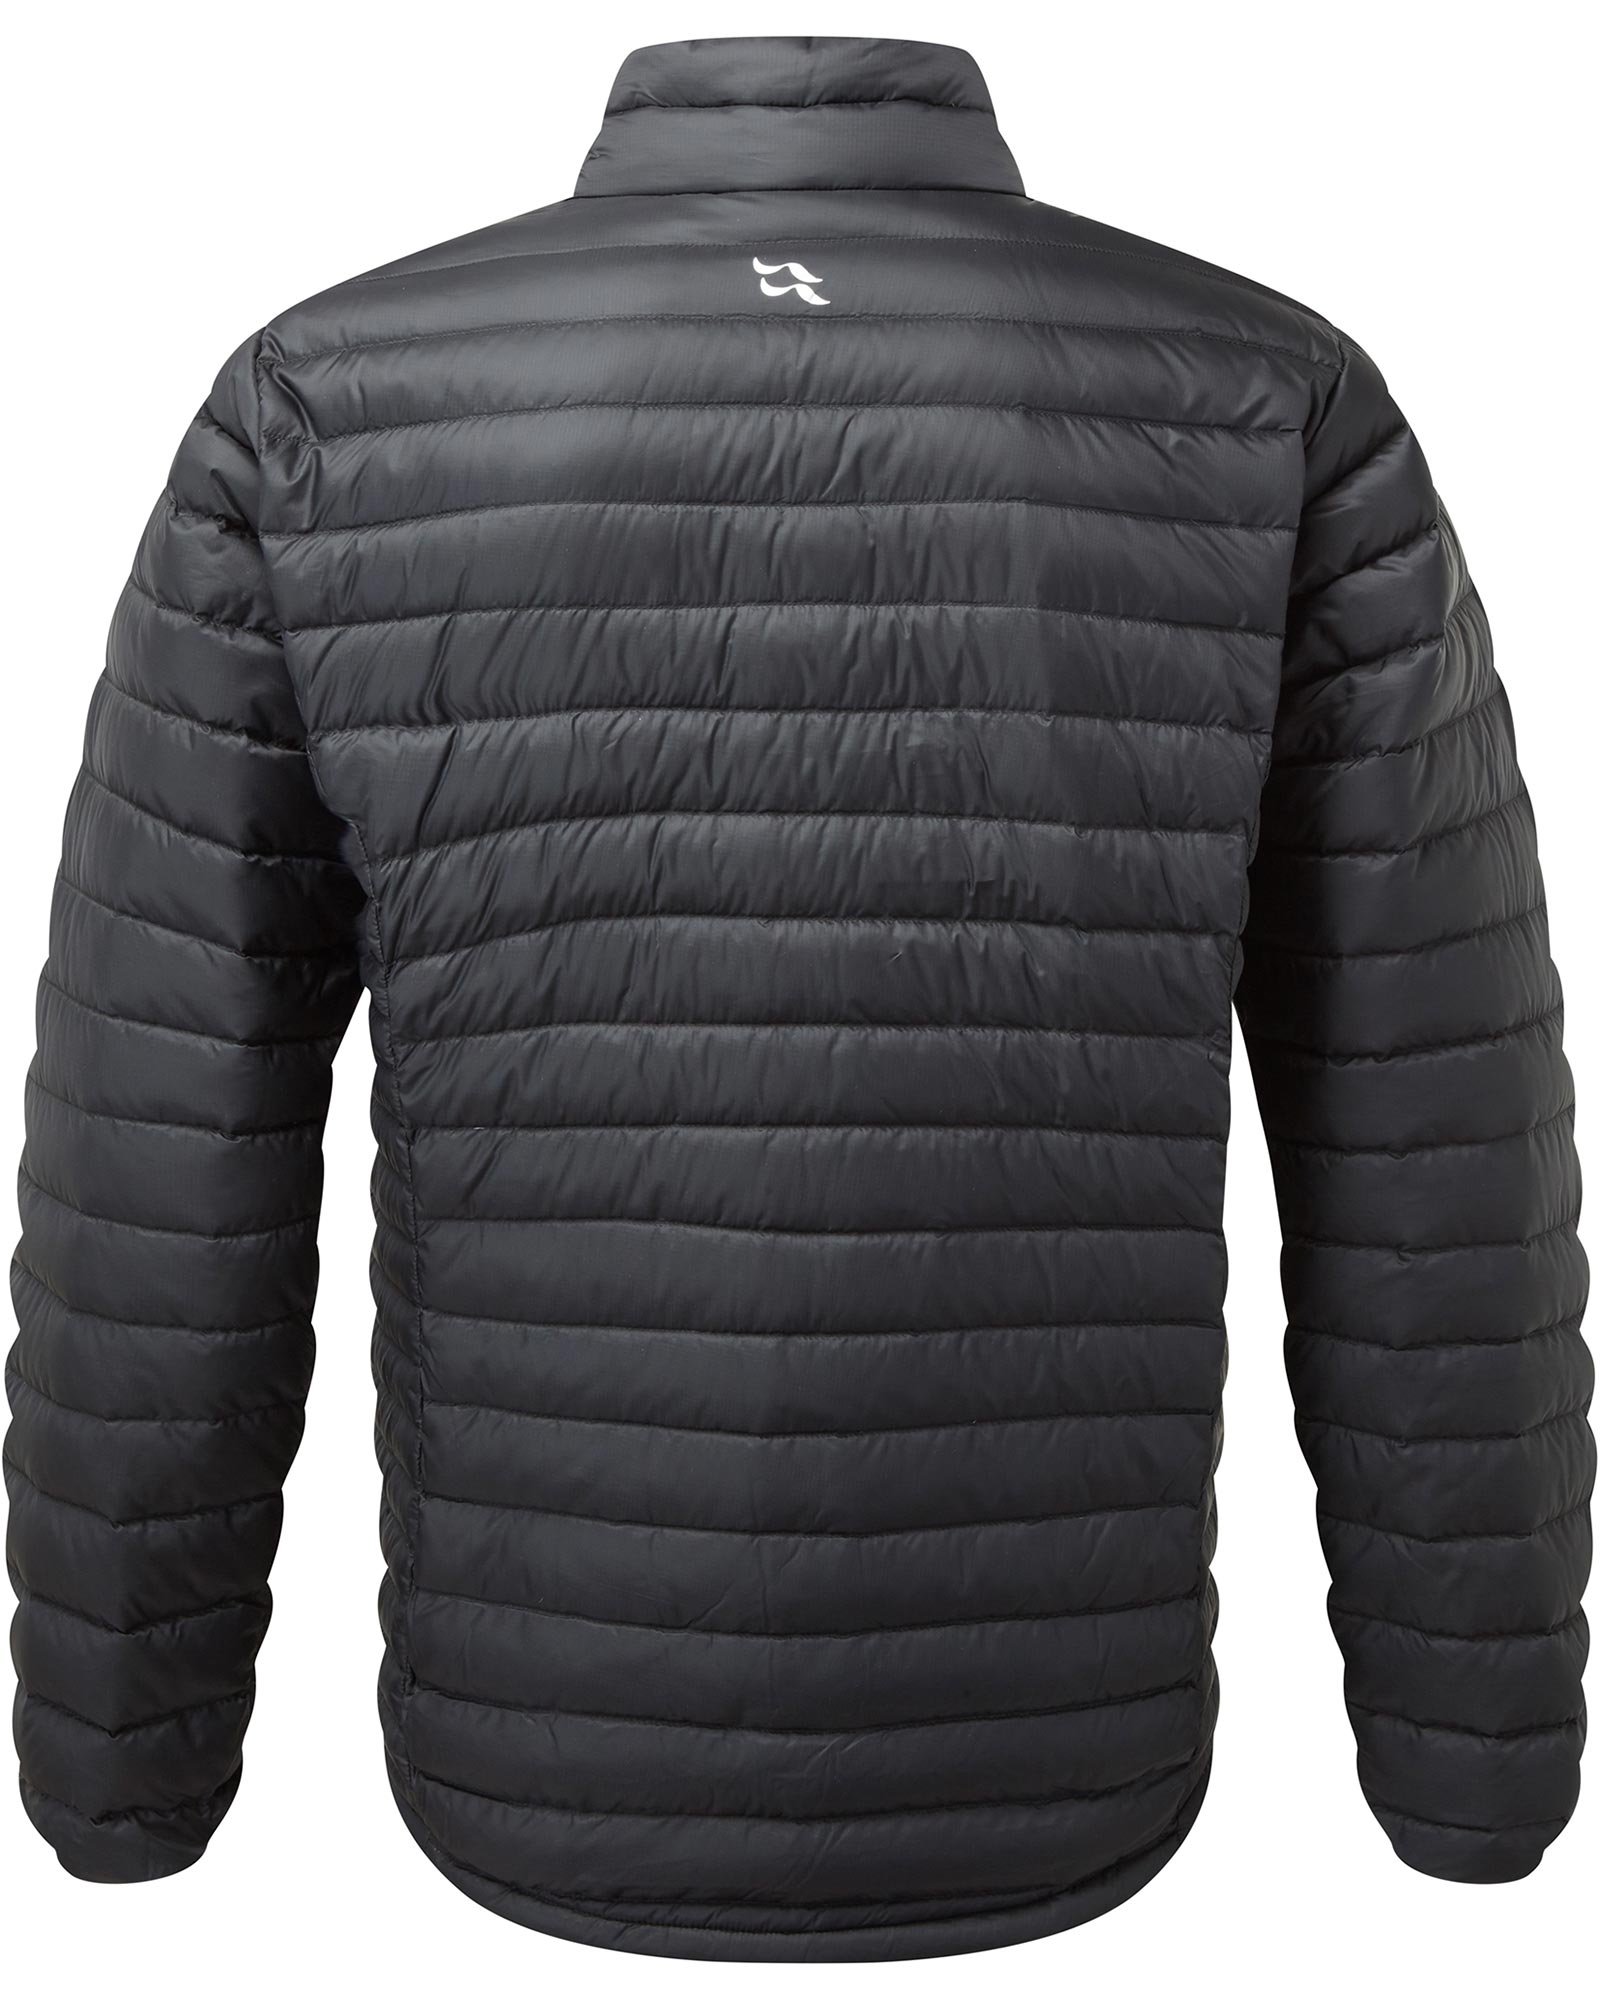 Rab Microlight Men's Jacket